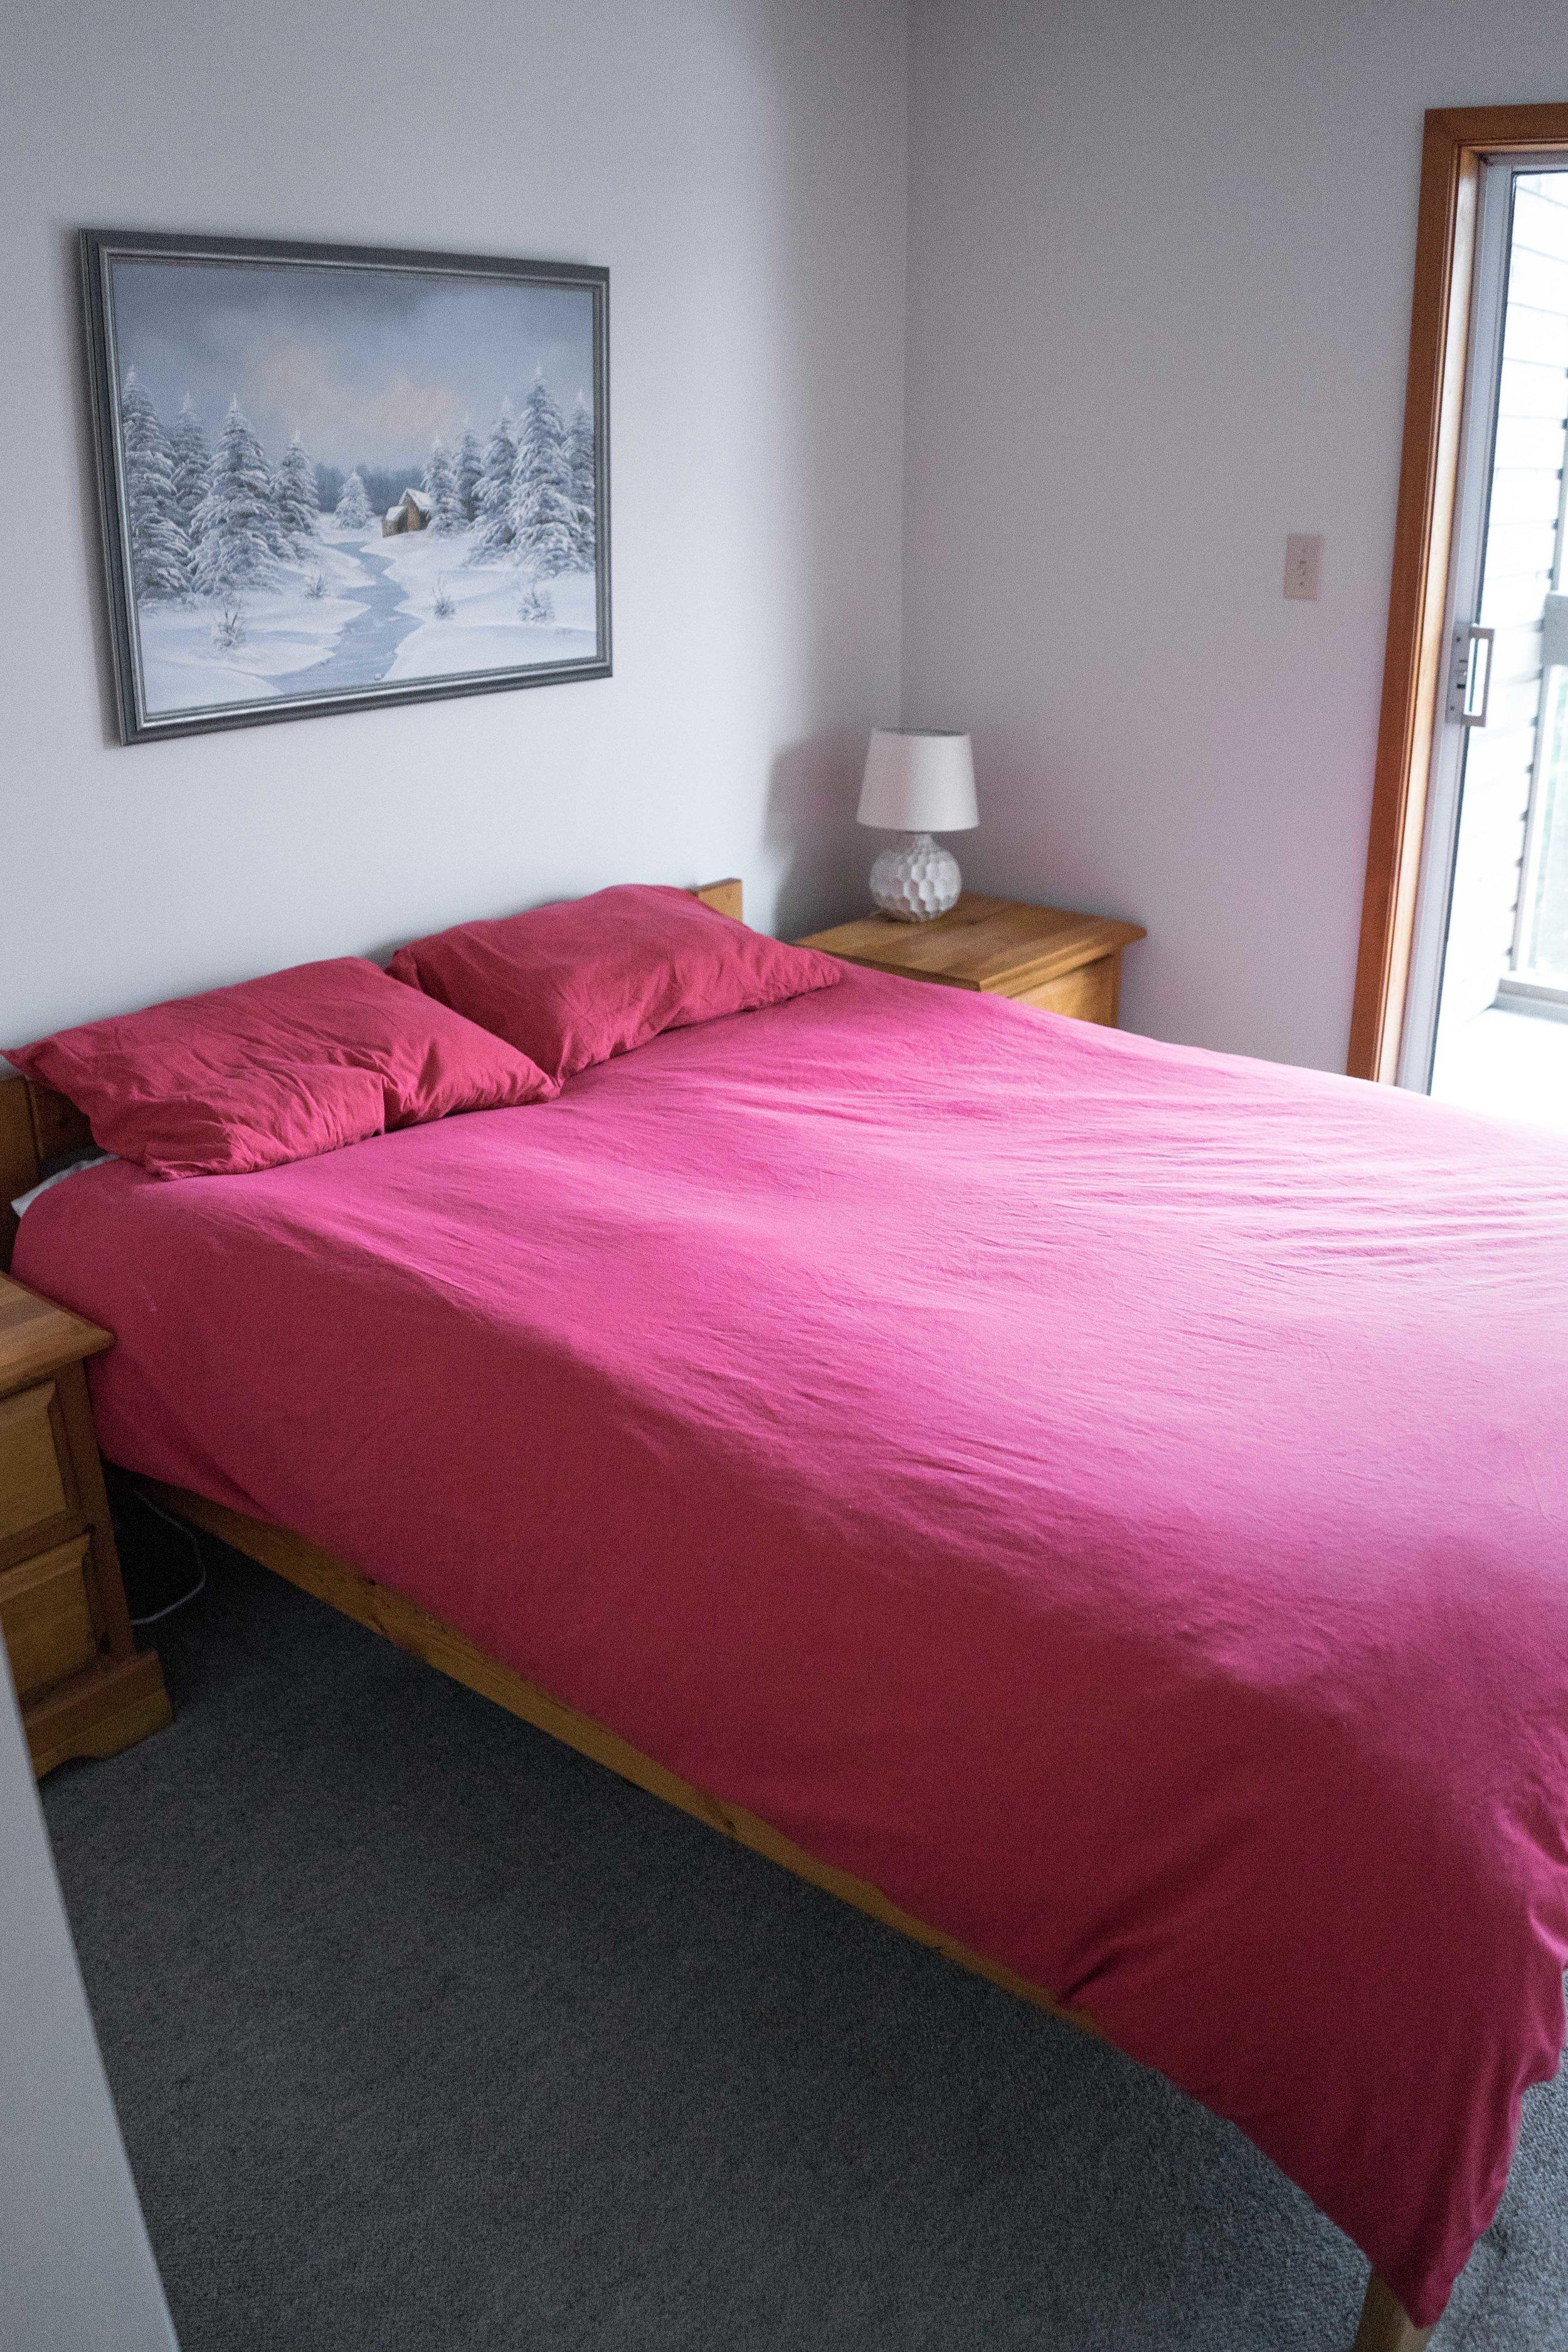 Whistler - Season - Accommodation - Franz's Chalet Bedroom 2